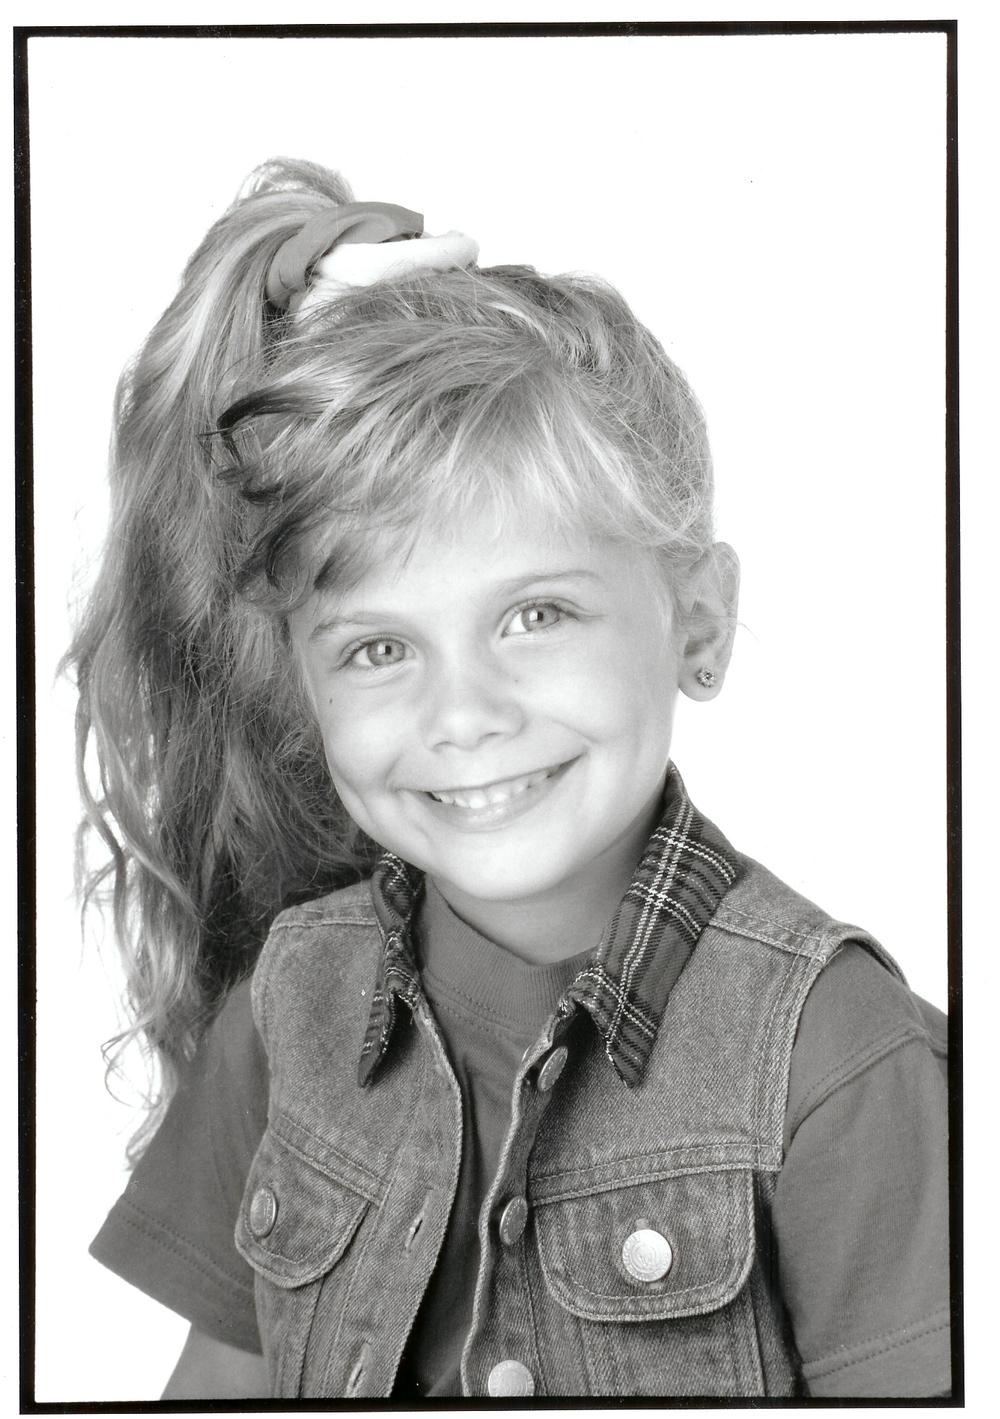 Marlee Roberts Headshot 1995